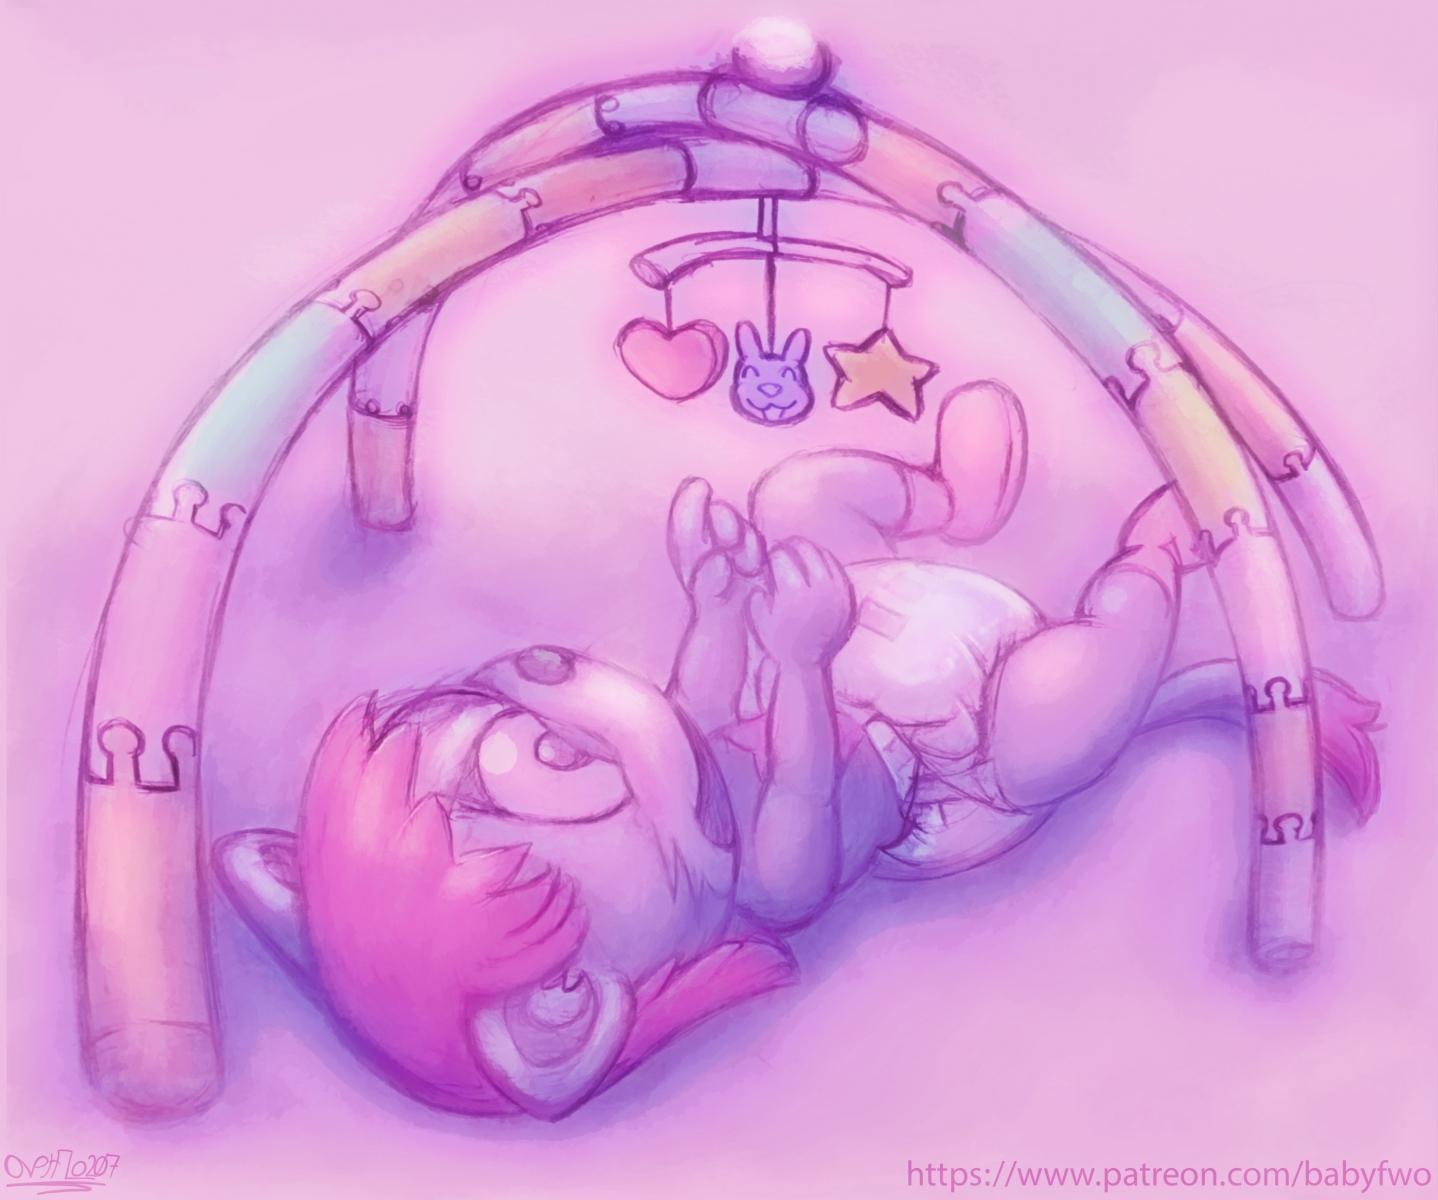 Kimi - Playpen by OverFlo207